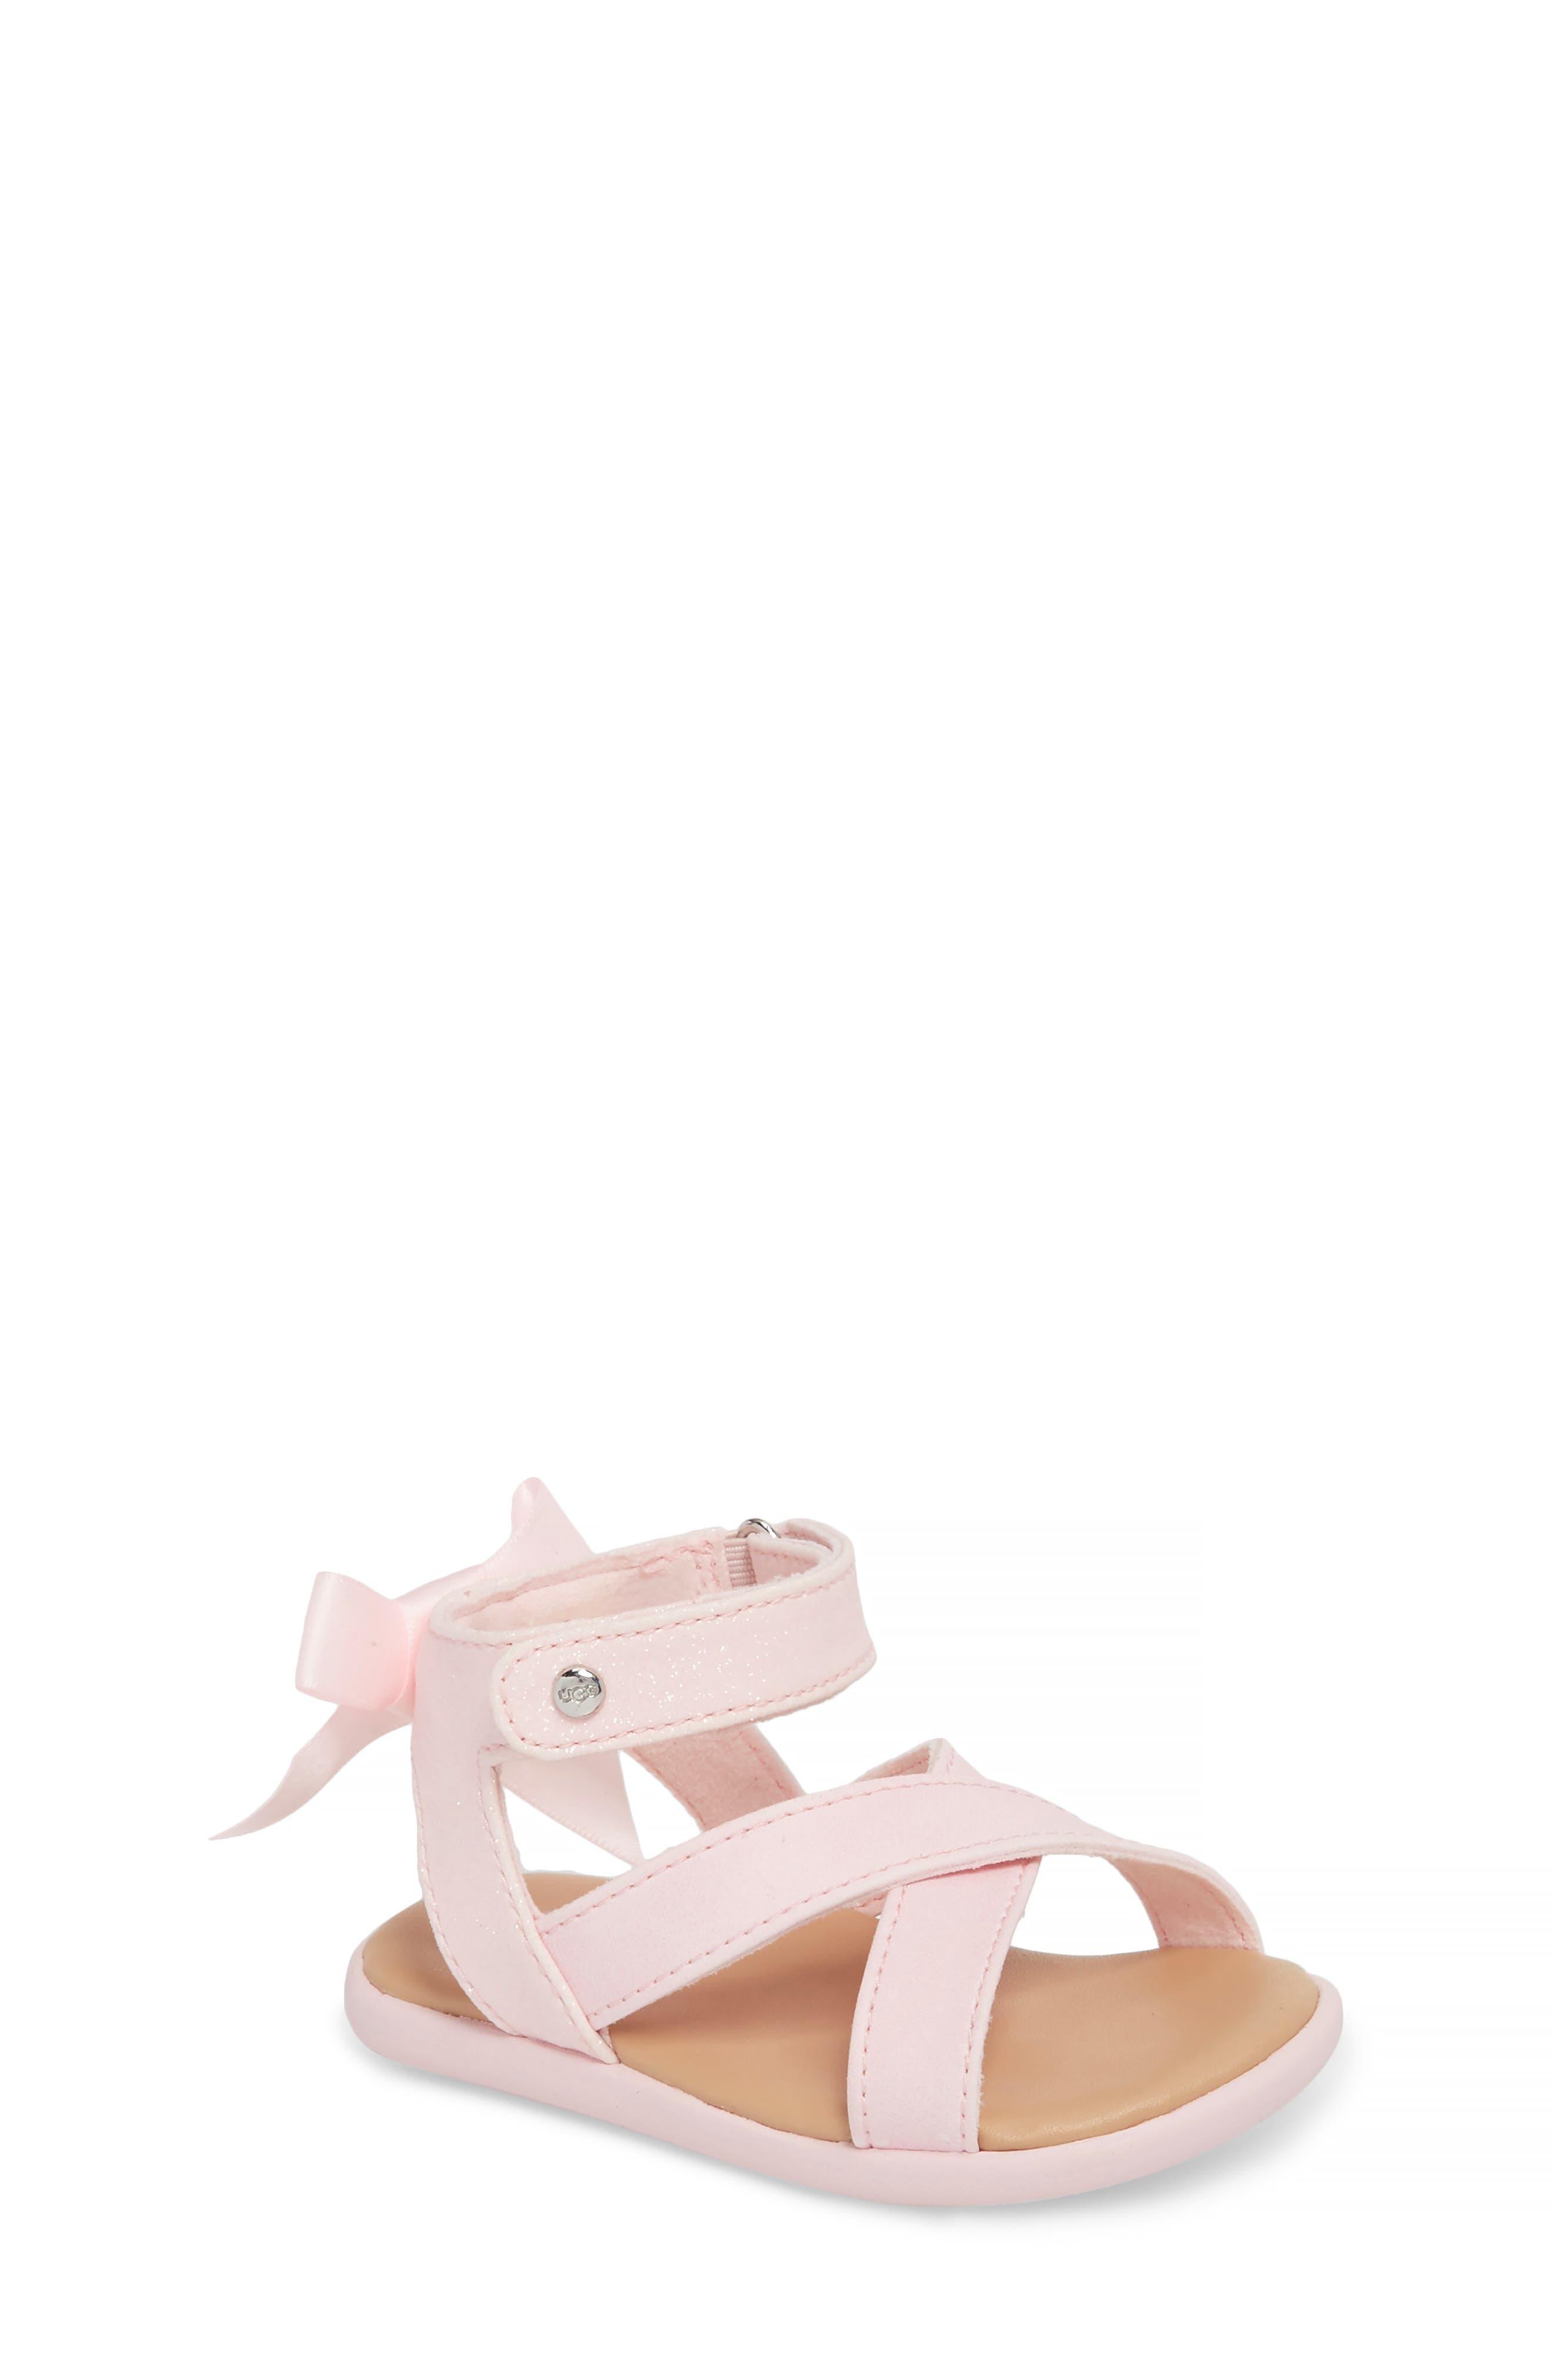 Maggiepie Sparkles Sandal,                         Main,                         color, Seashell Pink